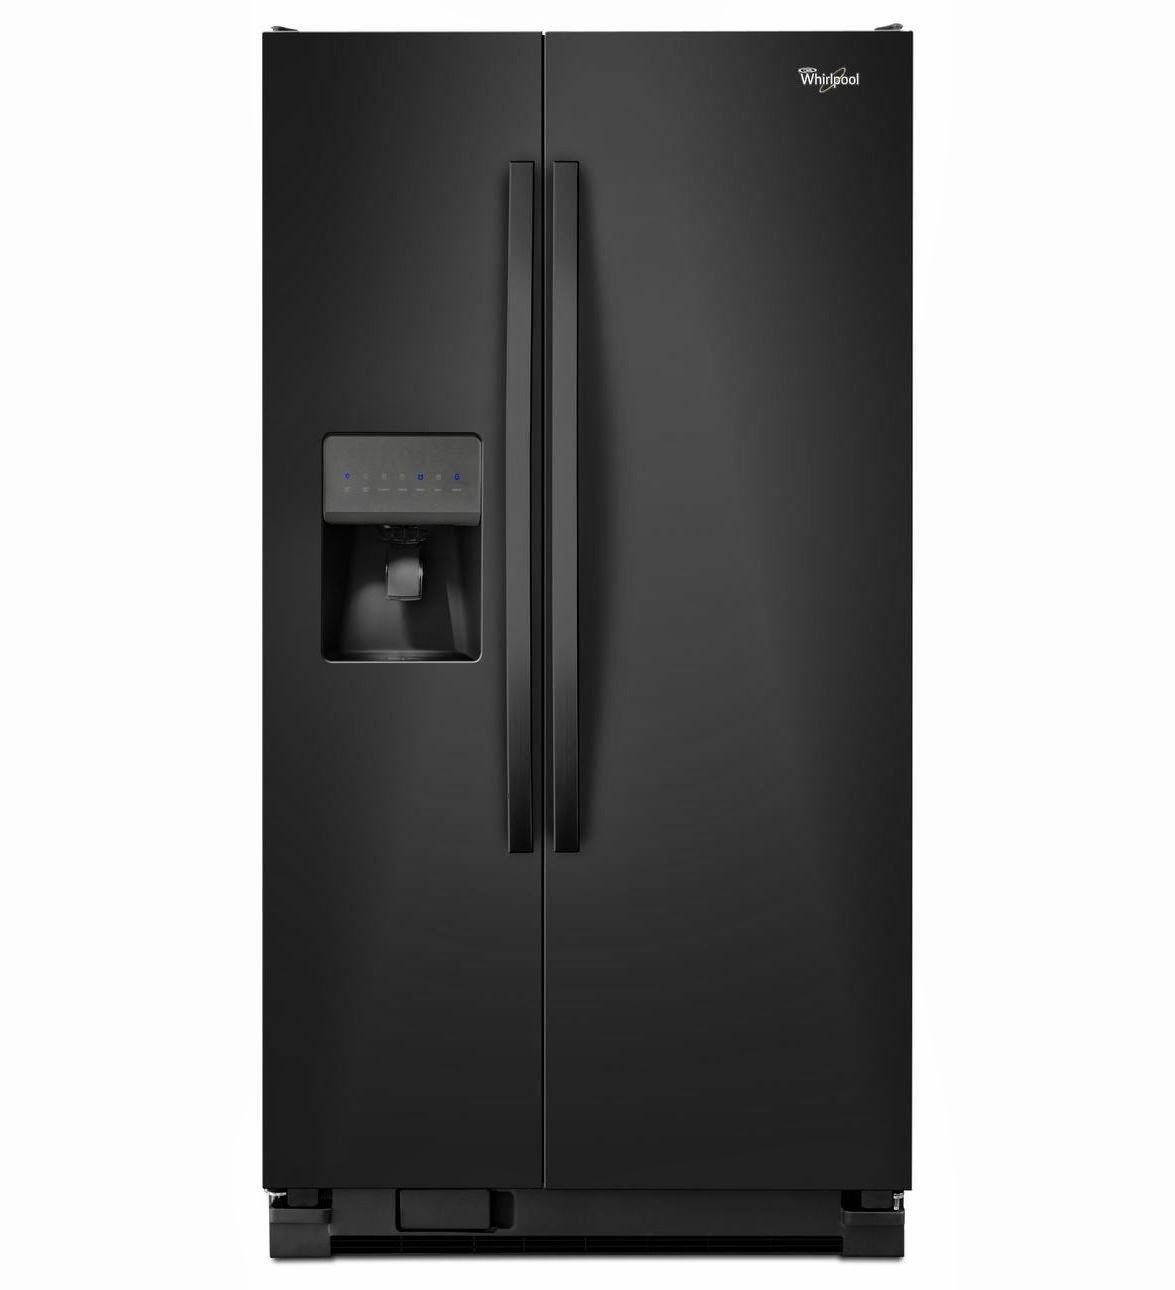 Whirlpool Refrigerator Brand Whirlpool Wrs325fdab